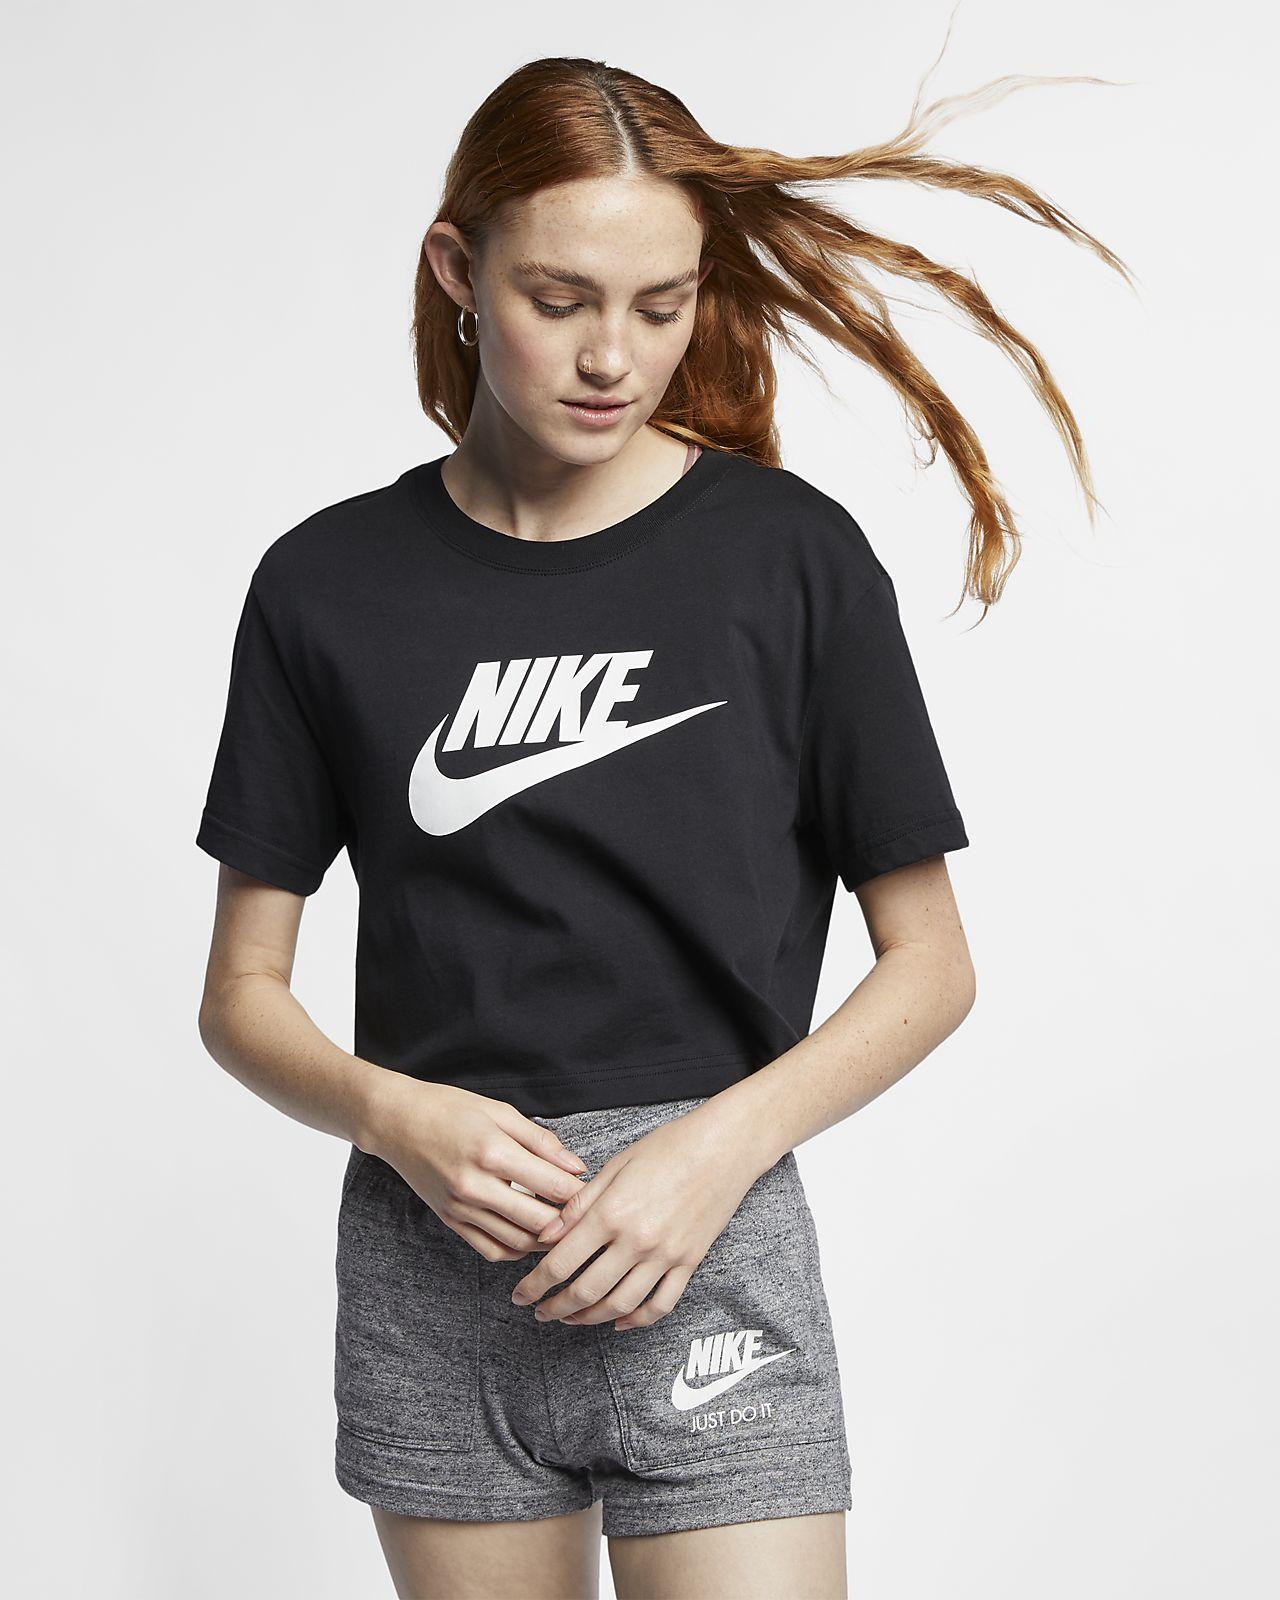 fe1f1d3289 Nike Sportswear Essential rövid szabású női póló. Nike.com HU